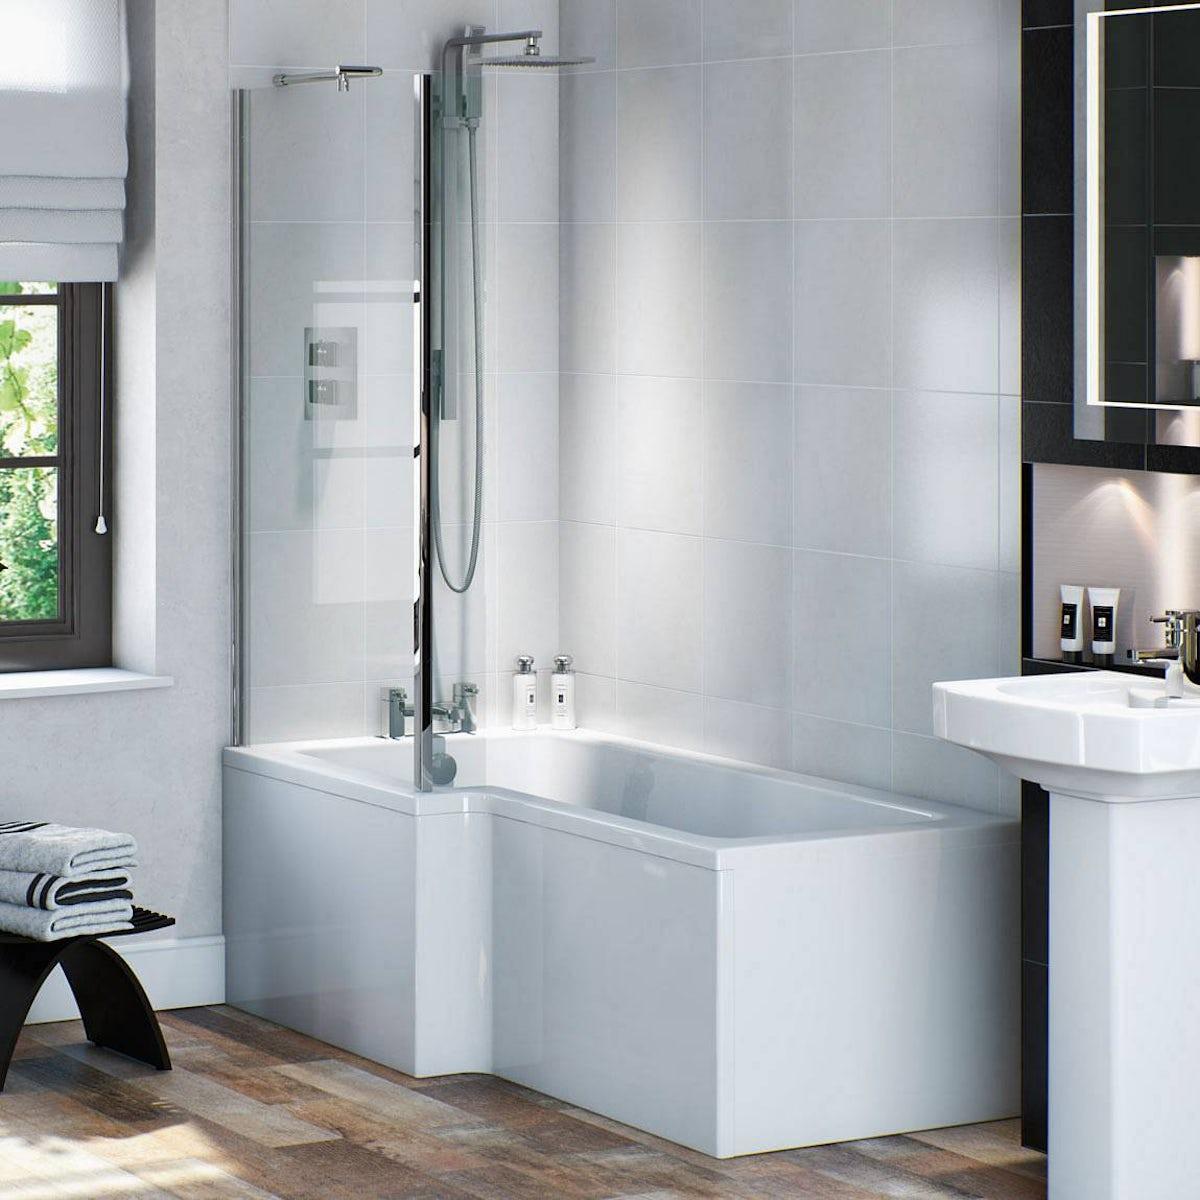 Bathroom Suites Ebay L Shaped Bathroom Suite Shaped Bathroom Suite 1500 Bath 1500mm